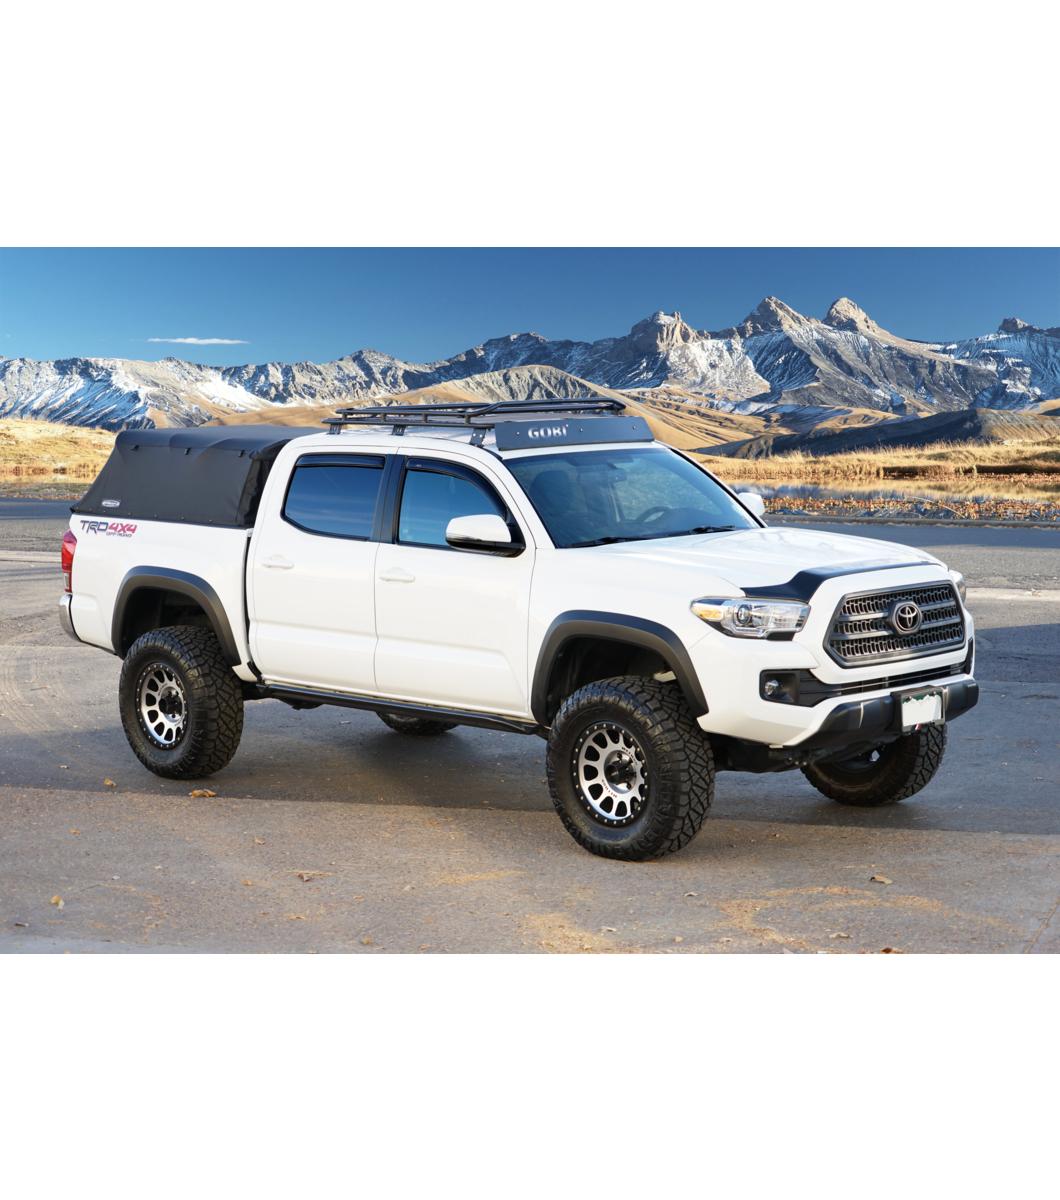 Toyota Tacoma 183 Stealth Rack 183 Lightbar Setup 183 No Sunroof